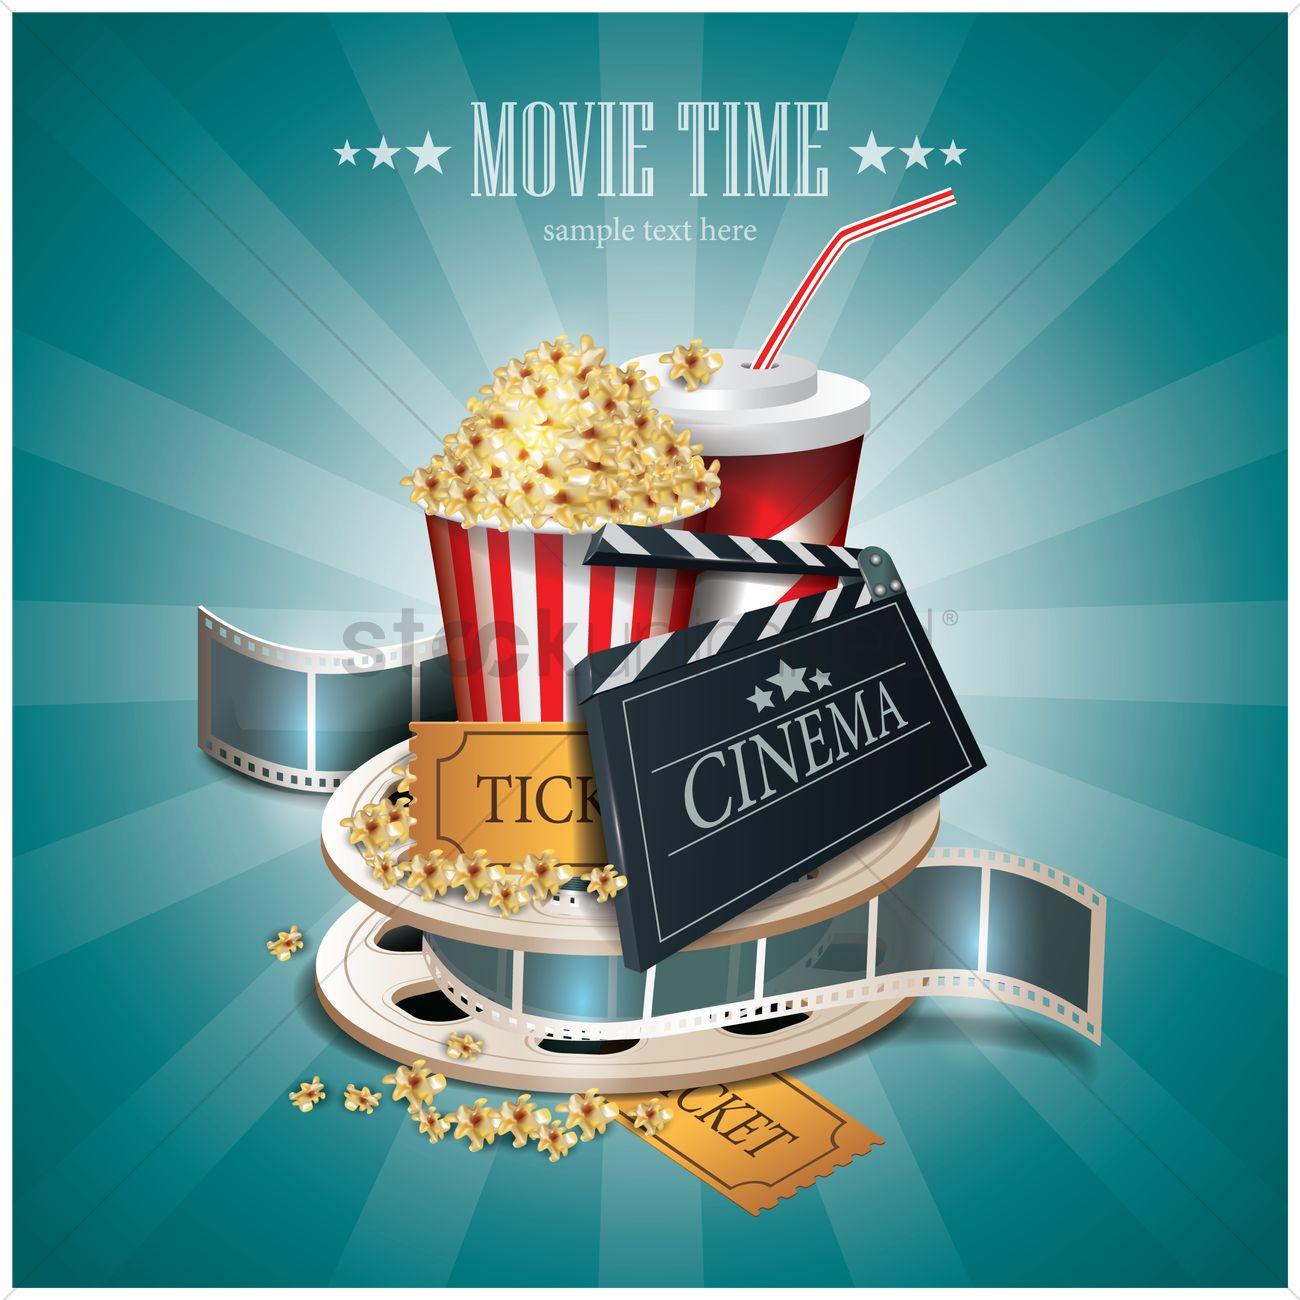 Popcorn Wallpaper: Movie Time Wallpaper Vector Image - 1804982